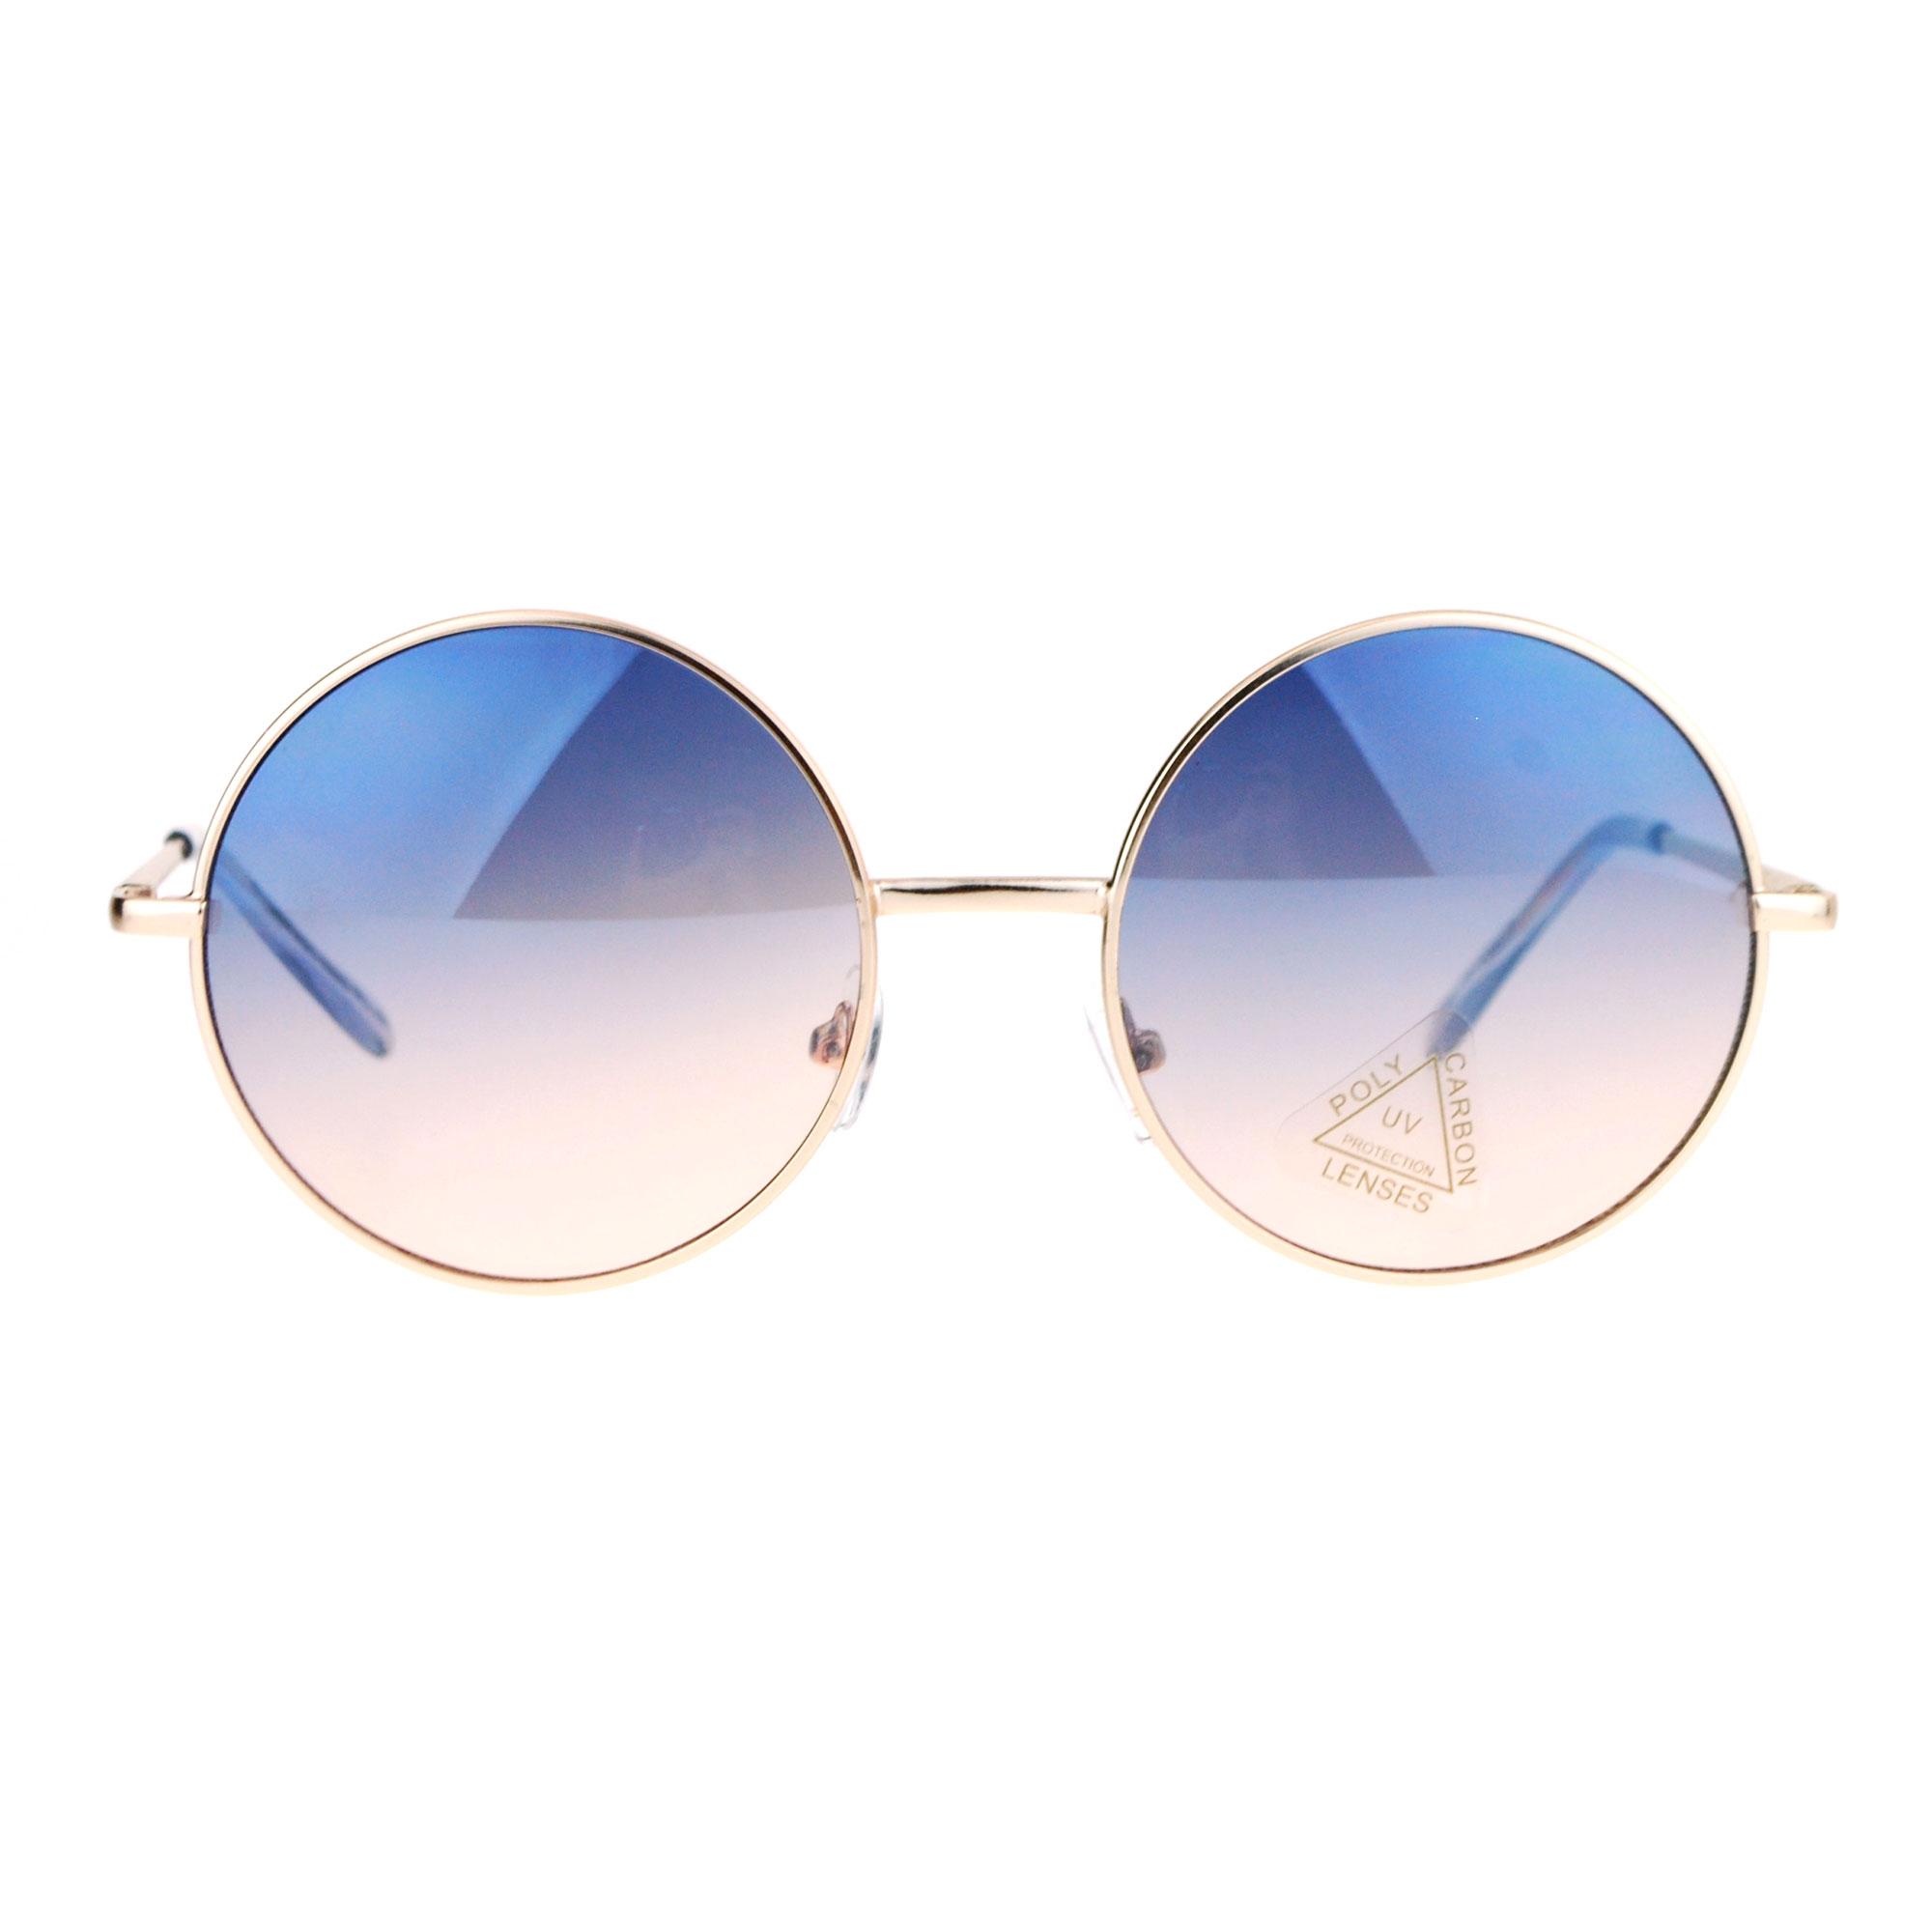 Colored Lens Sunglasses  sa106 oceanic color lens round circle hippie sunglasses ebay